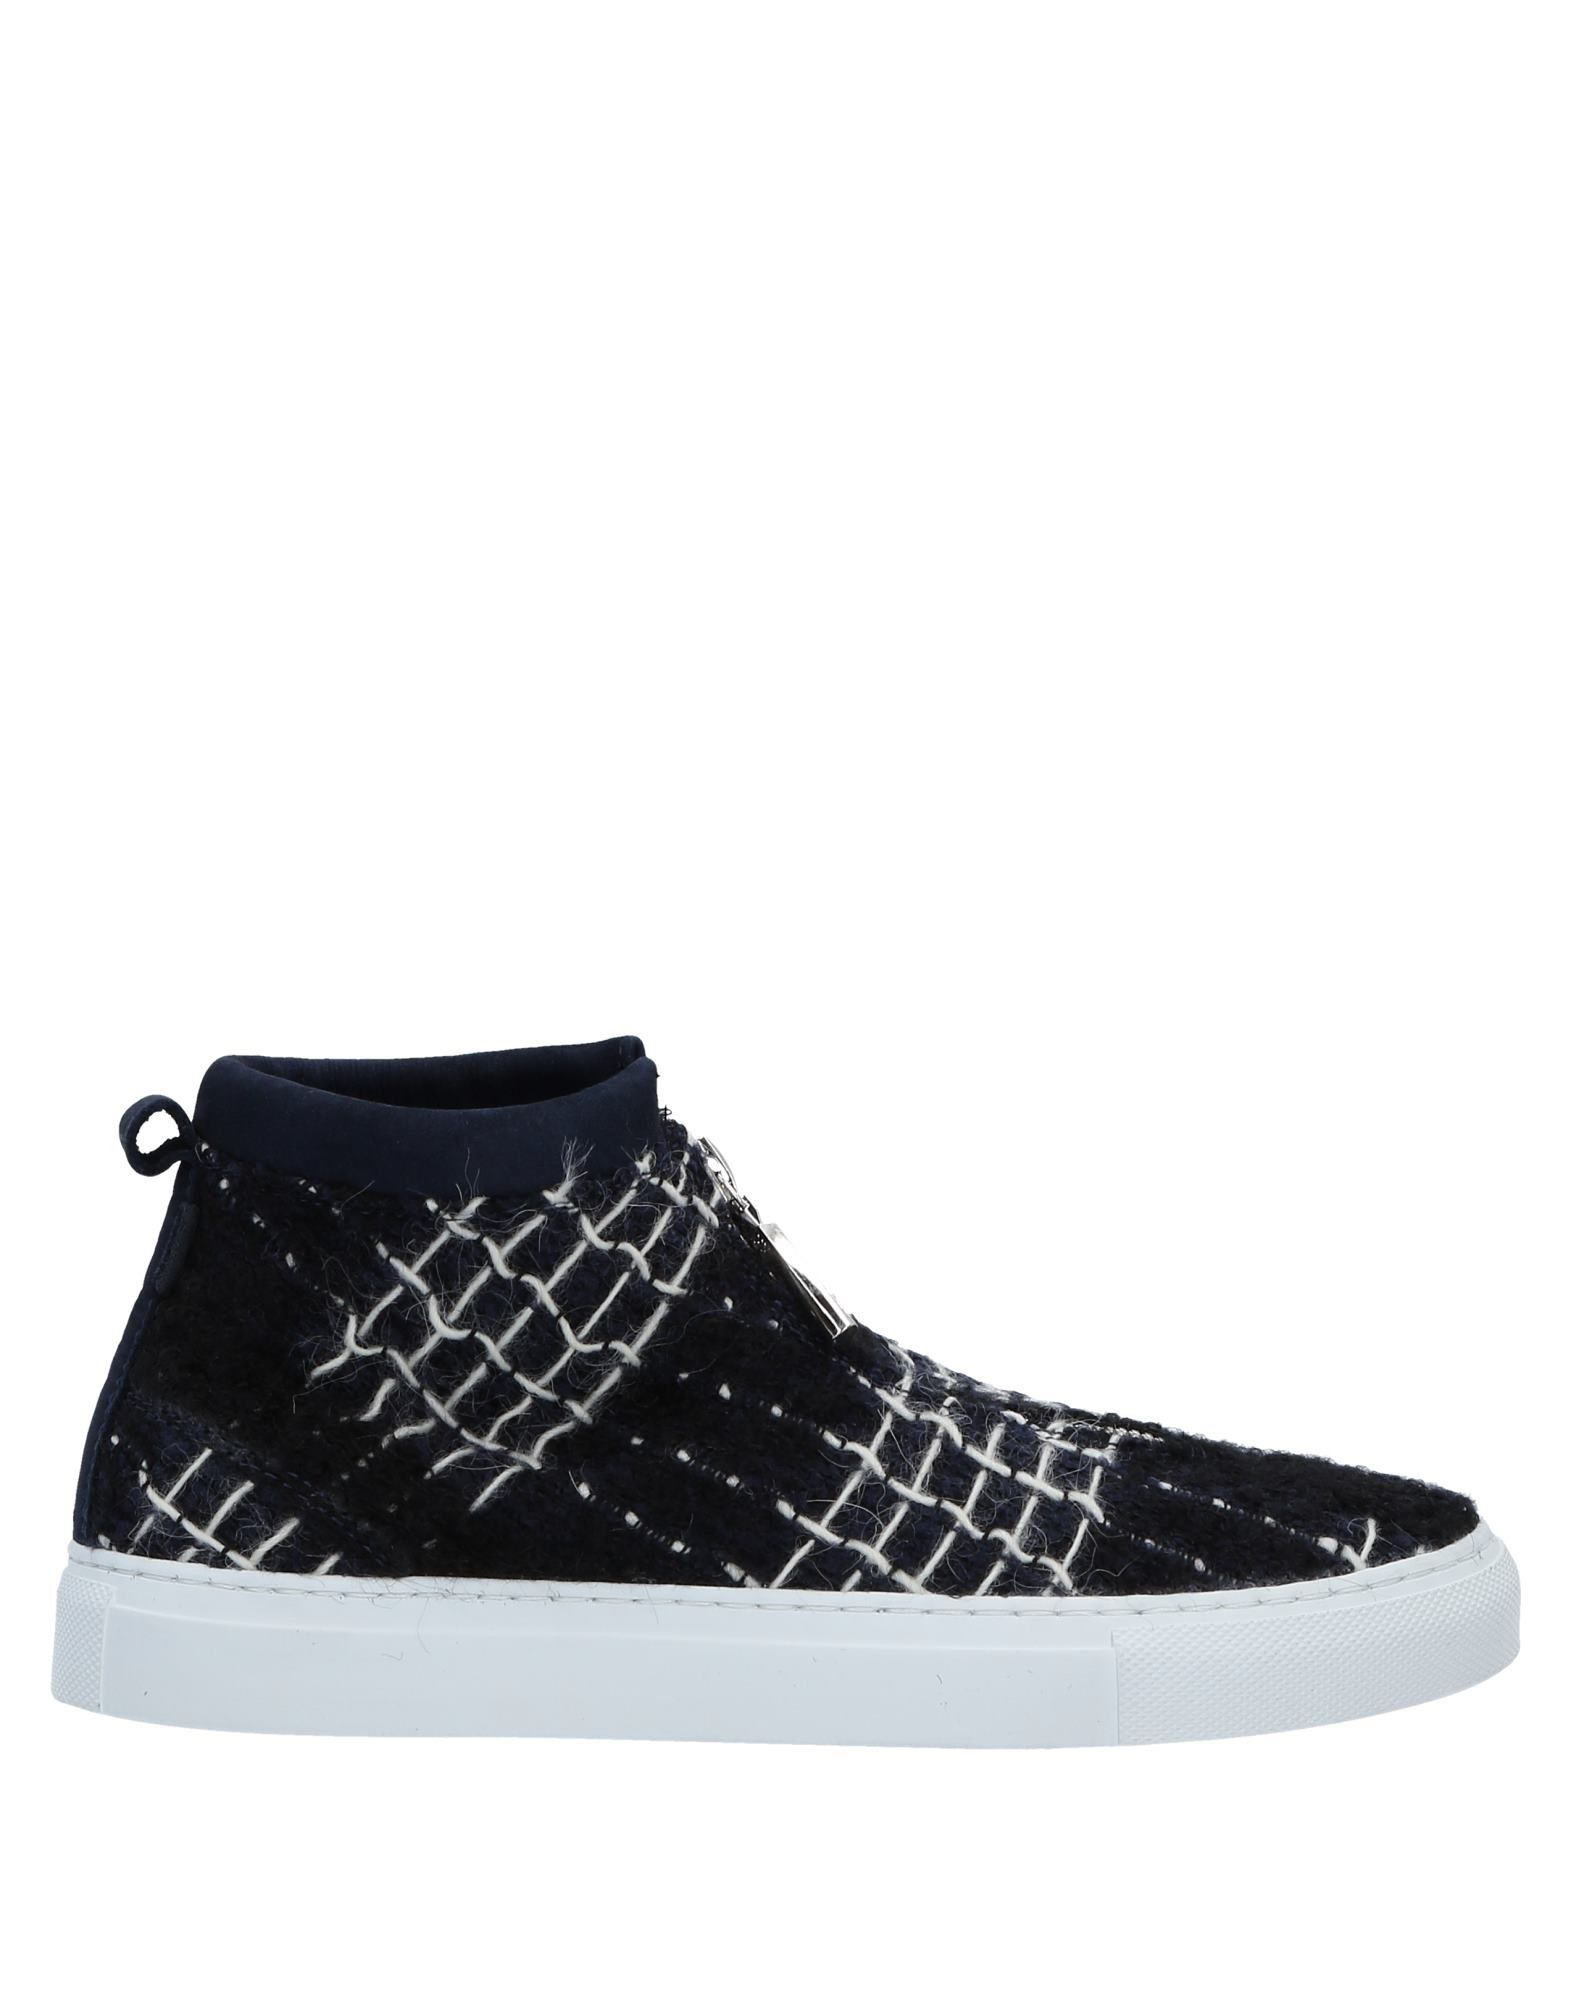 Moda - Sneakers Diemme Donna - Moda 11500608SQ 4ac8d6